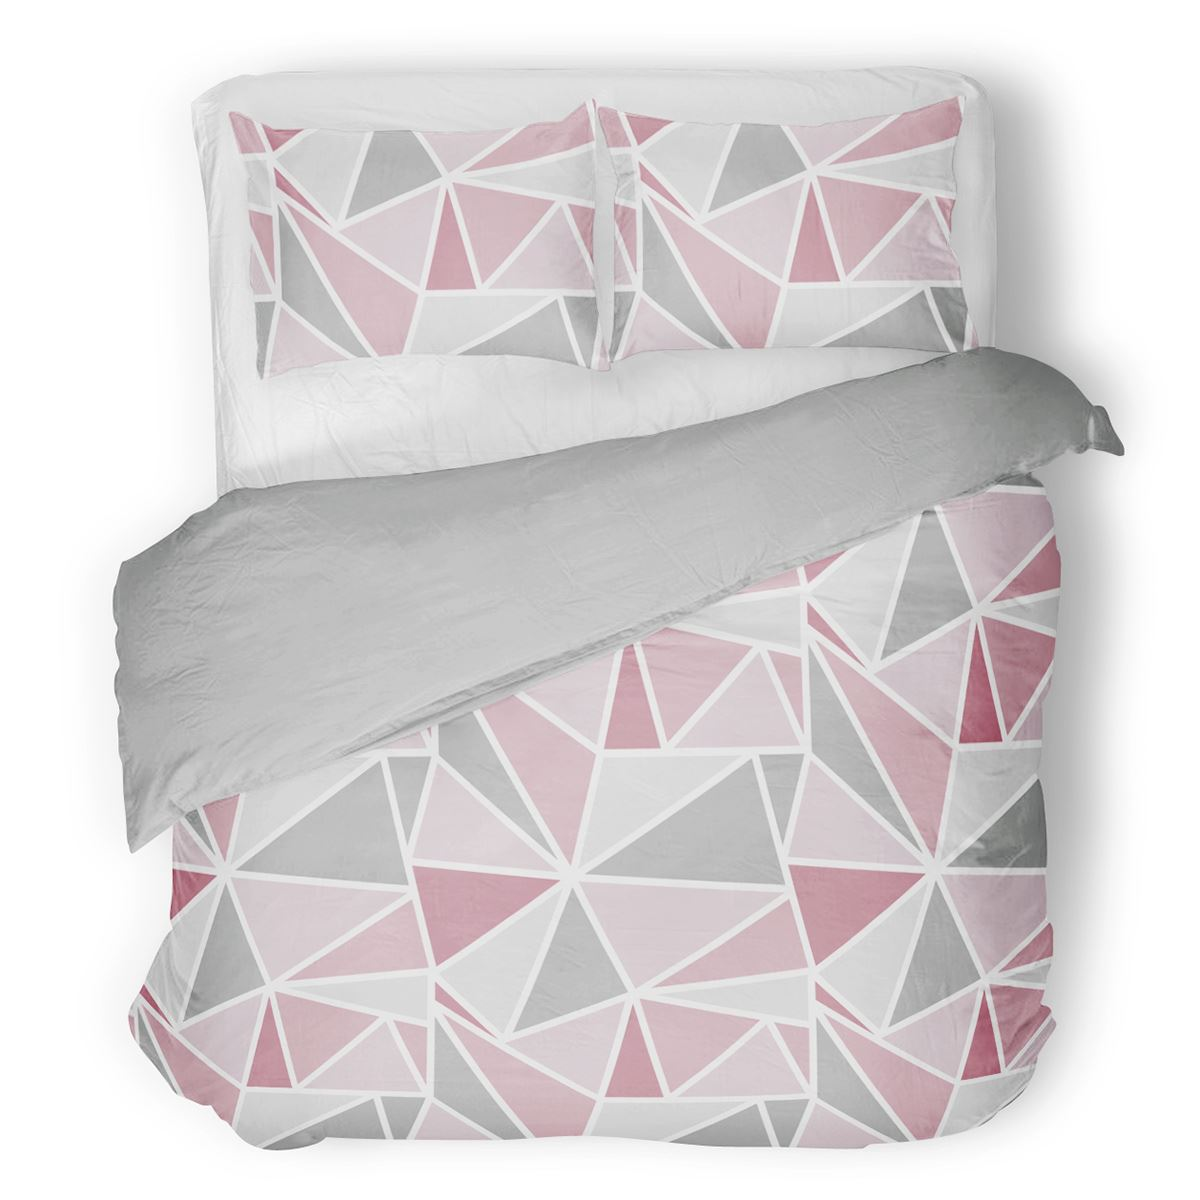 Metro Geometric Triangle Pink Grey Duvet Cover Set Single